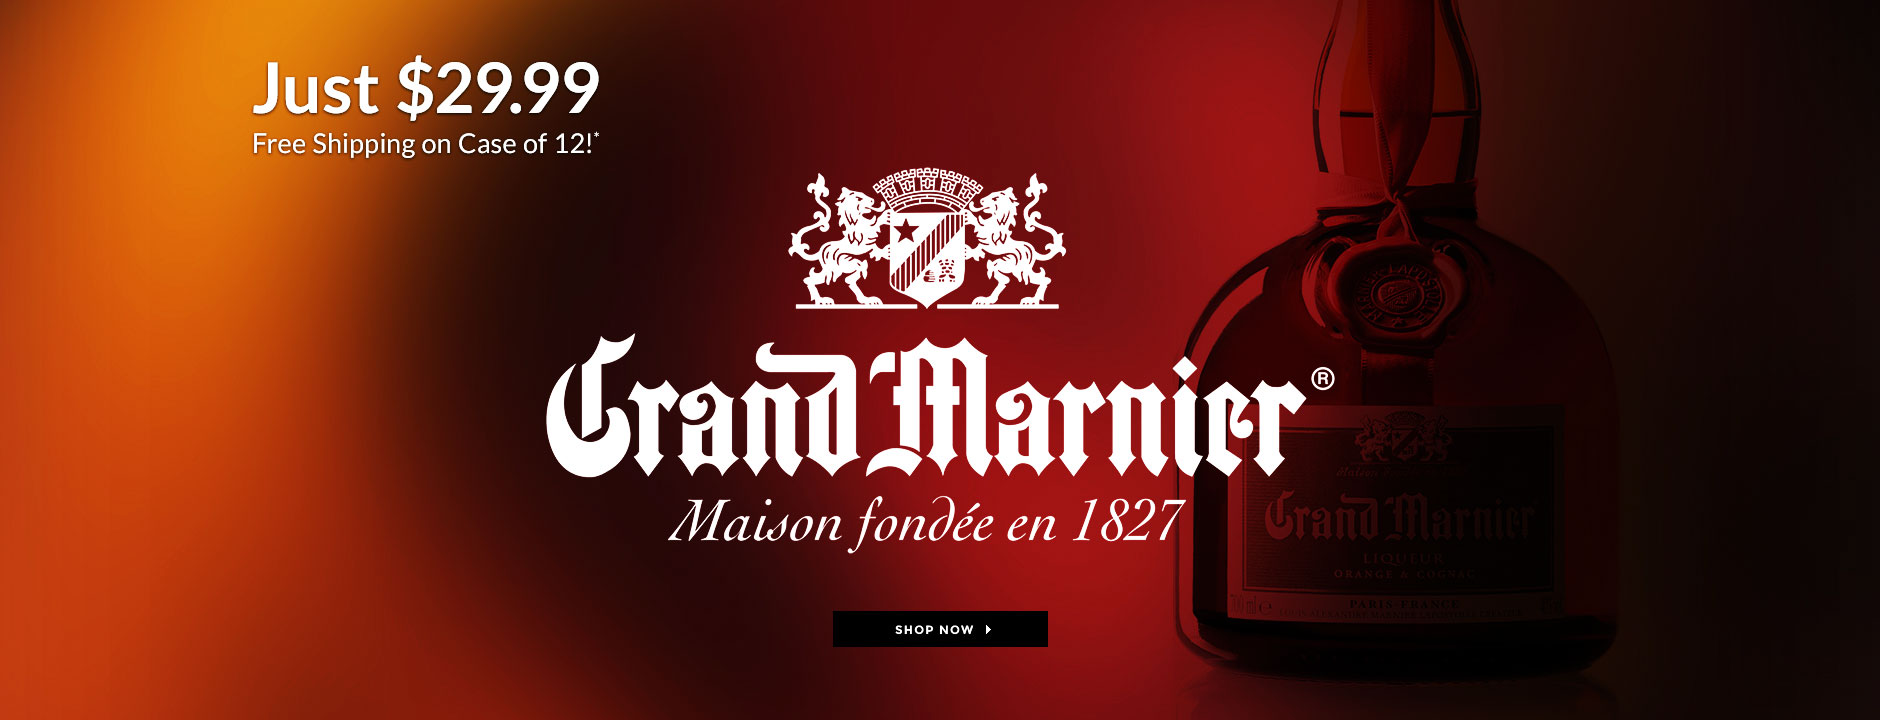 Grand Marnier Just 29.99 Free Shipping